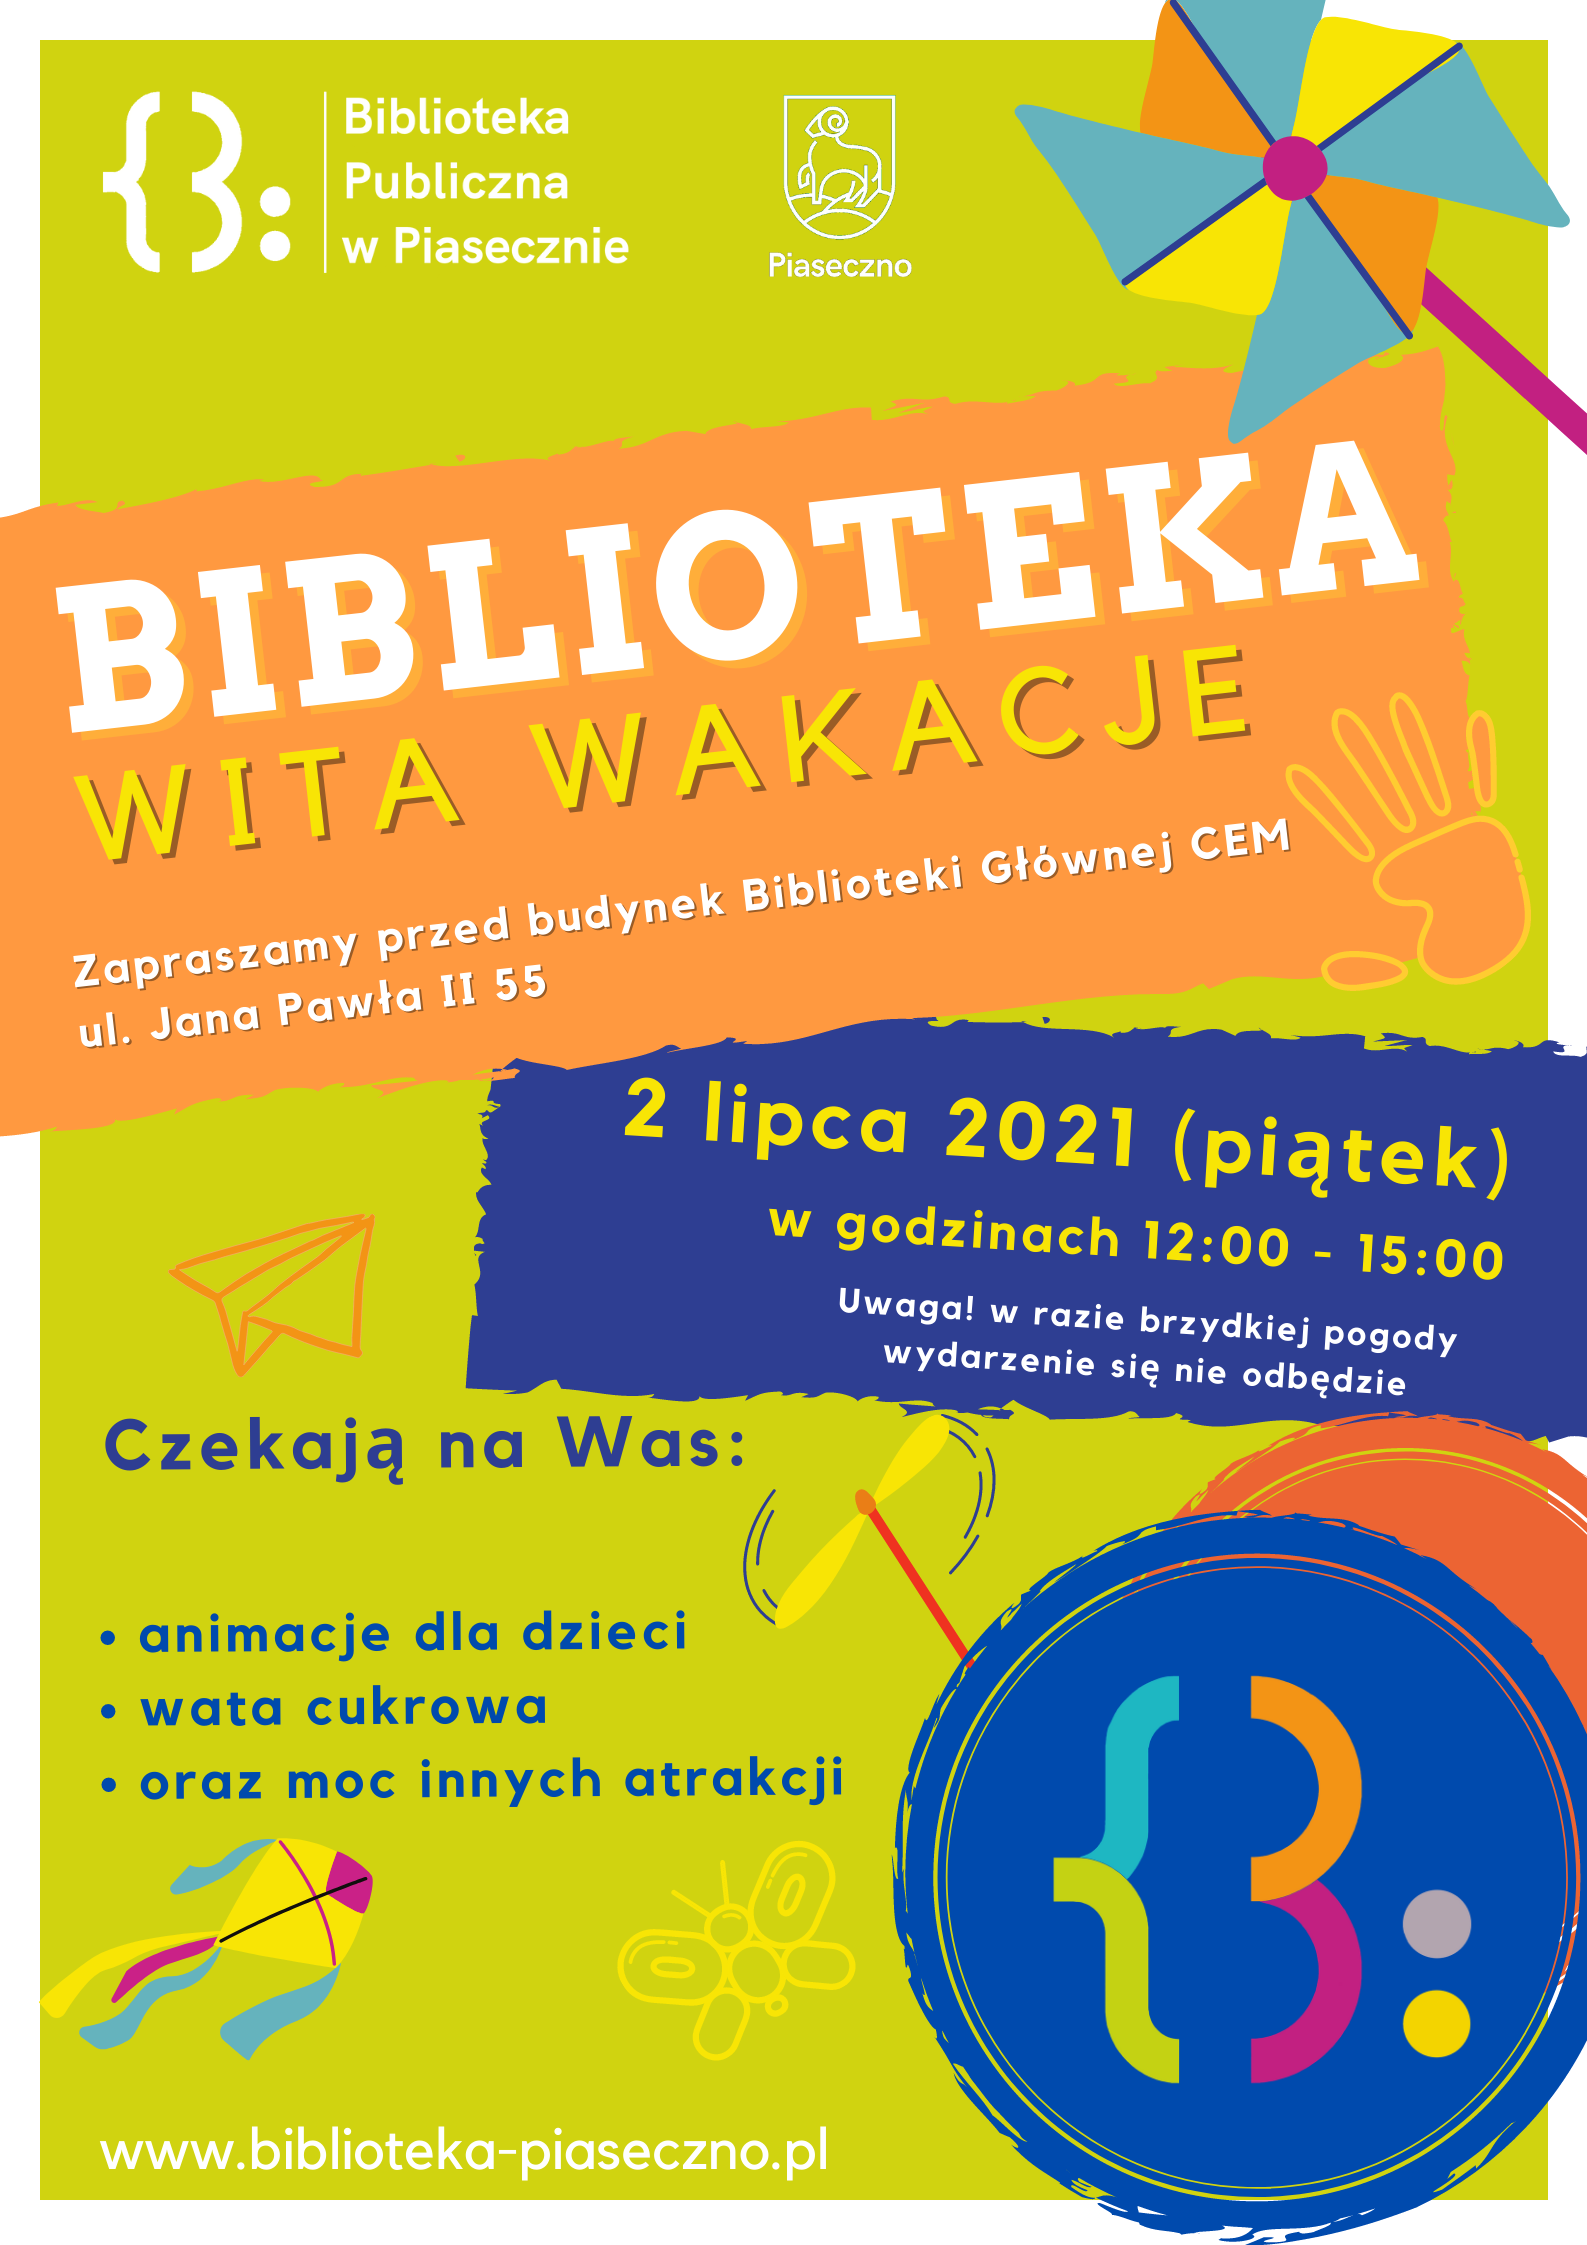 Biblioteka Wita Wakacje